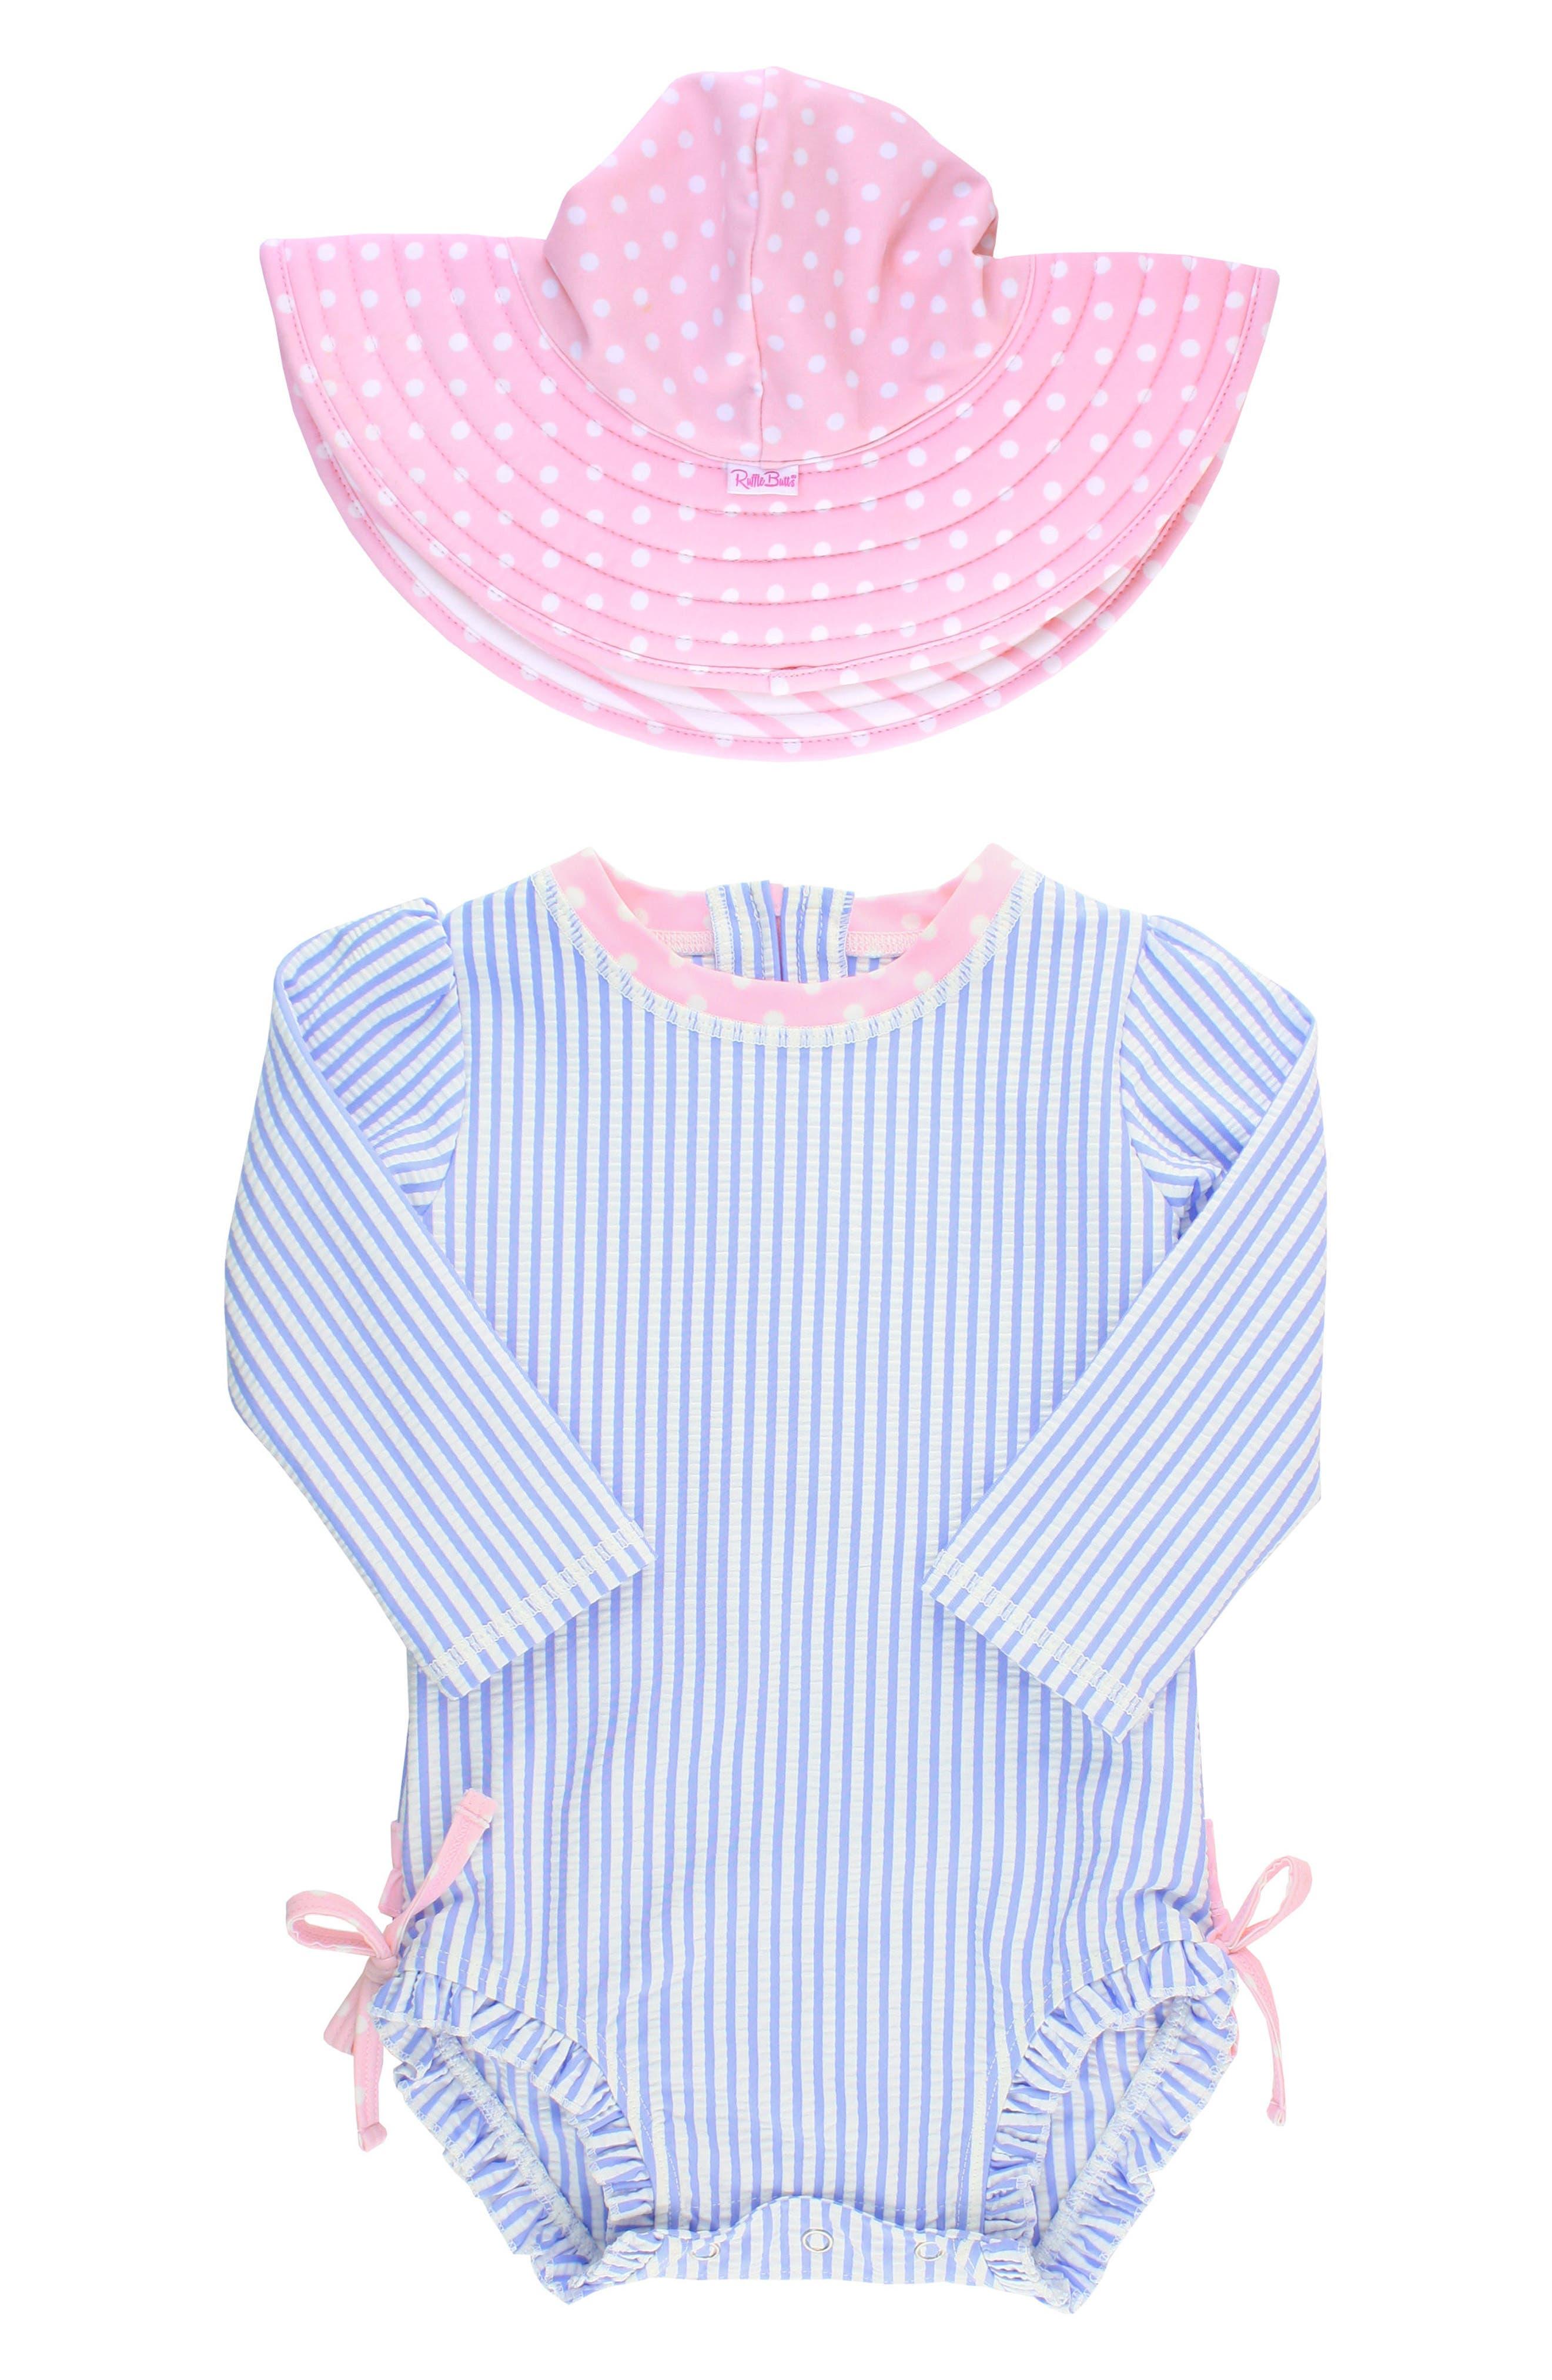 Ruffle Butts Seersucker One-Piece Rashguard Swimsuit & Hat Set,                             Main thumbnail 1, color,                             BLUE